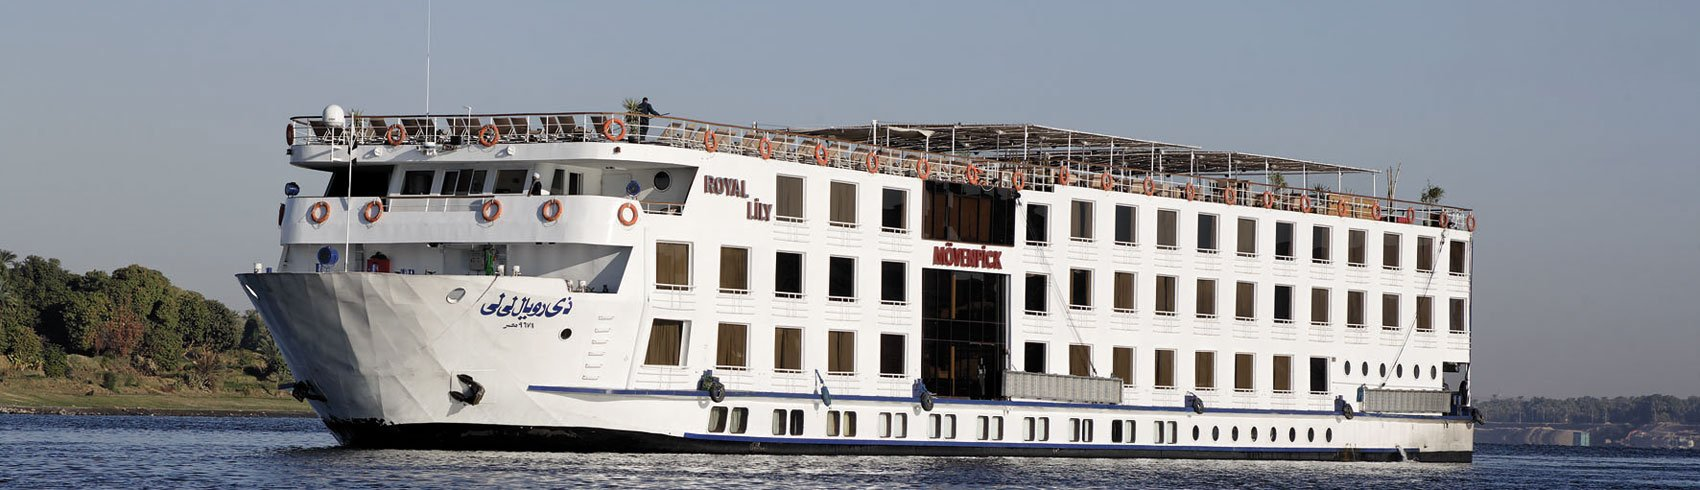 Luxor and Aswan trips - Mövenpick MS Royal Lily